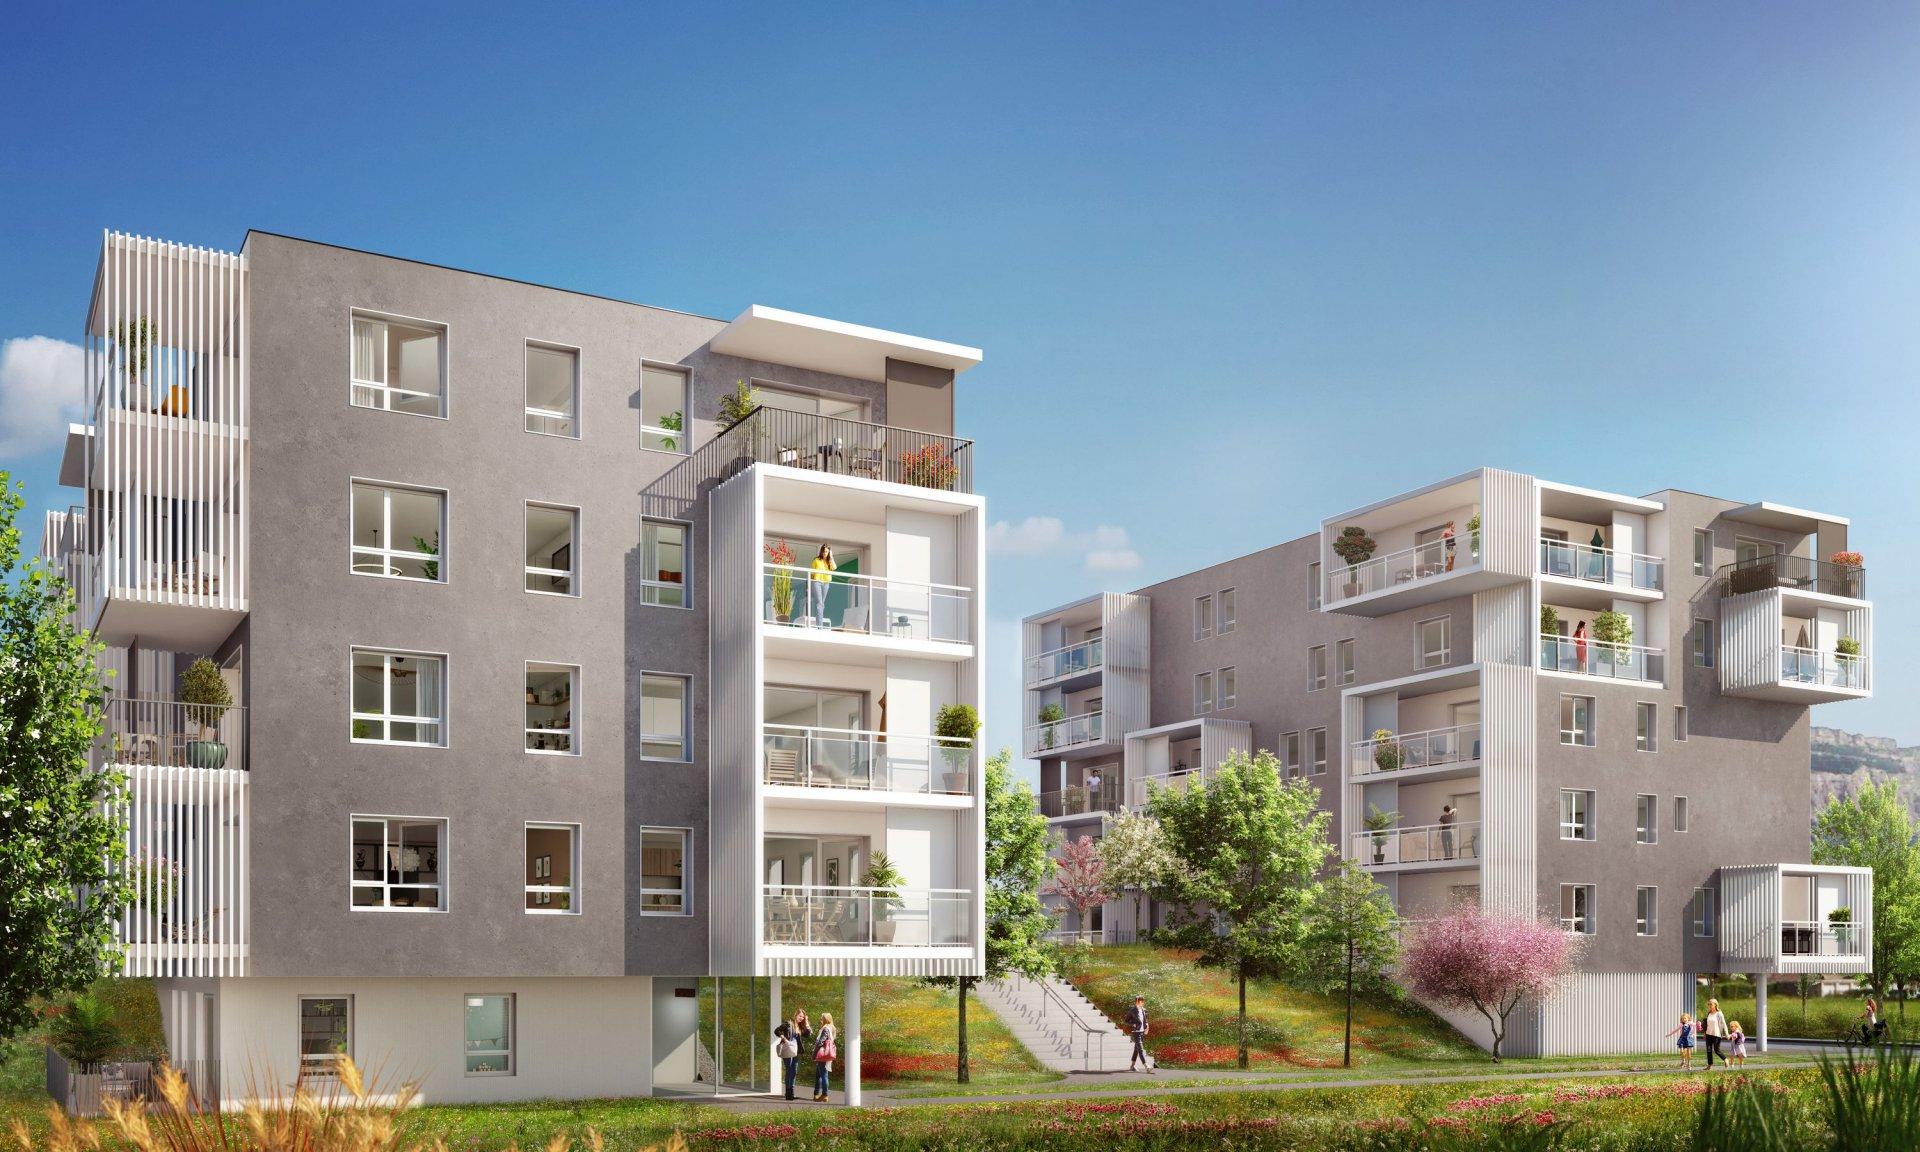 Programme Immeuble - Saint-Martin-d'Hères